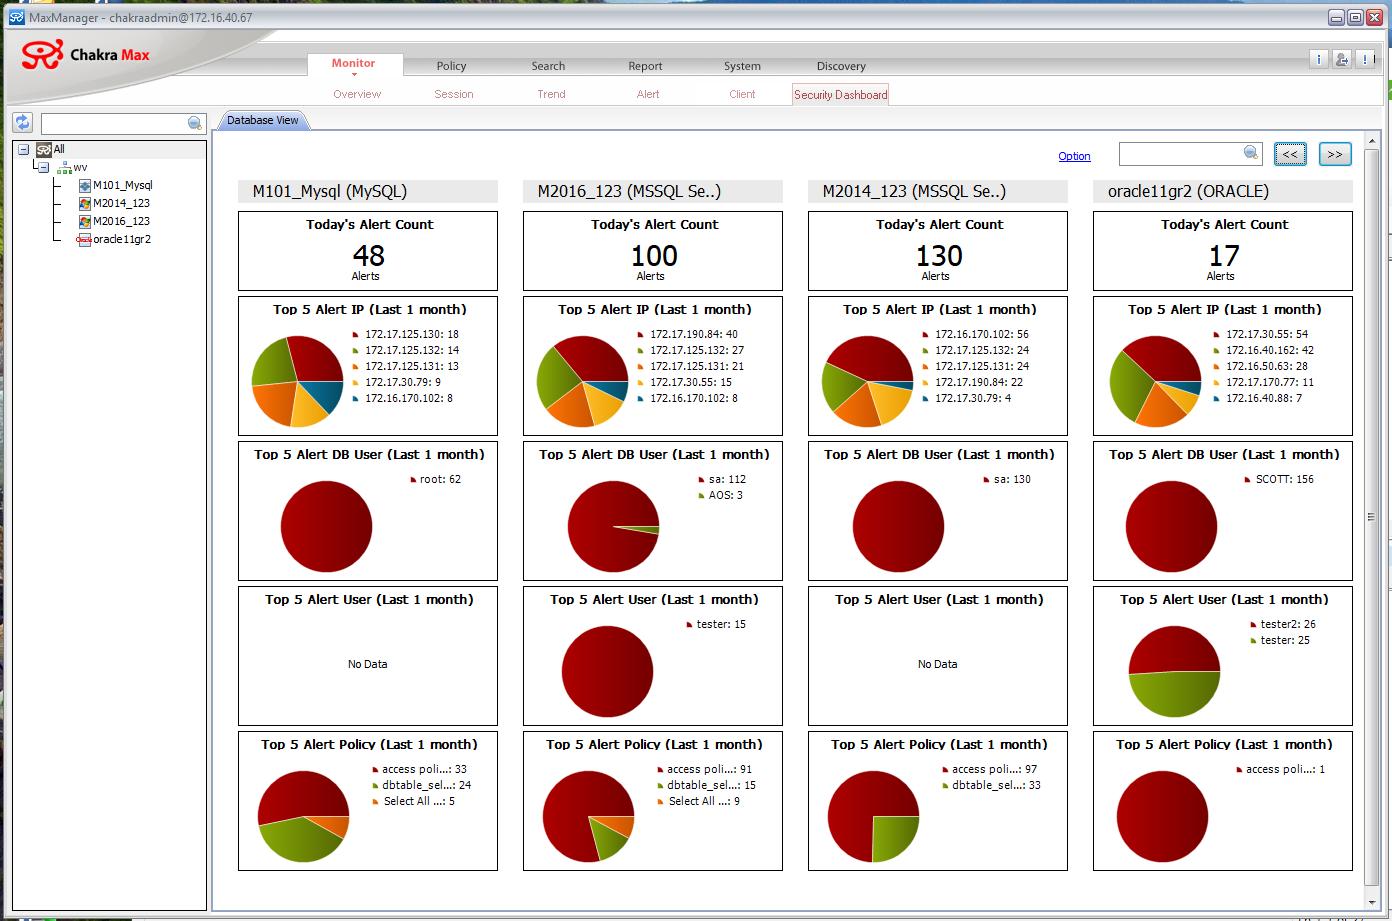 Monitoring DB Activity in IRI Chakra Max 3